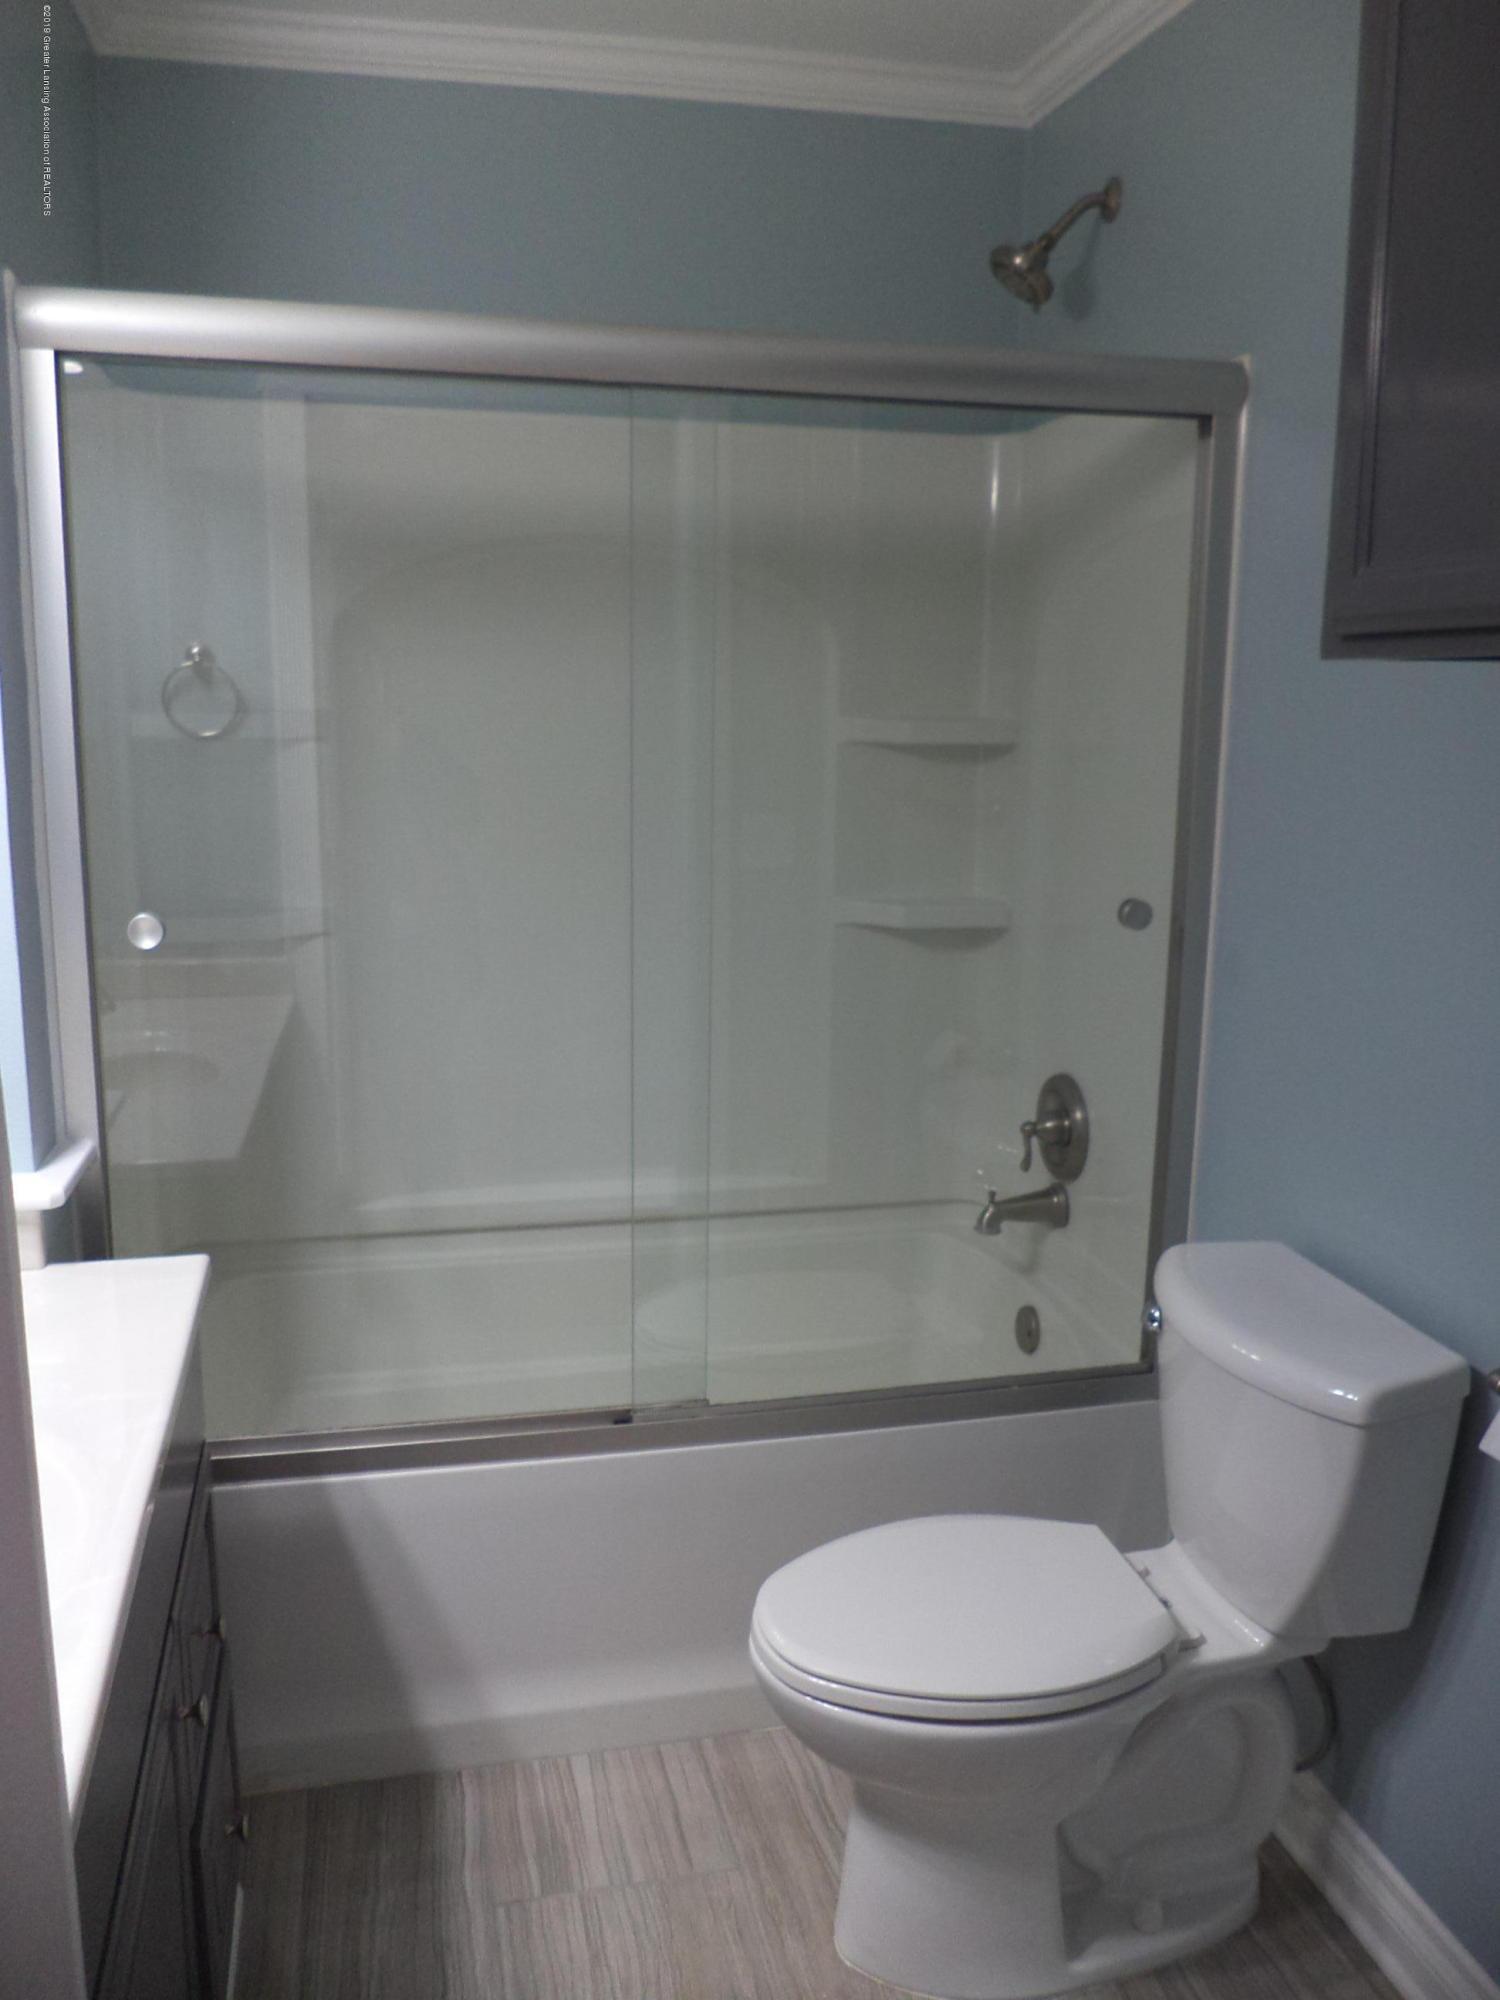 3200 S Dewitt Rd - Main bath tub shower - 13